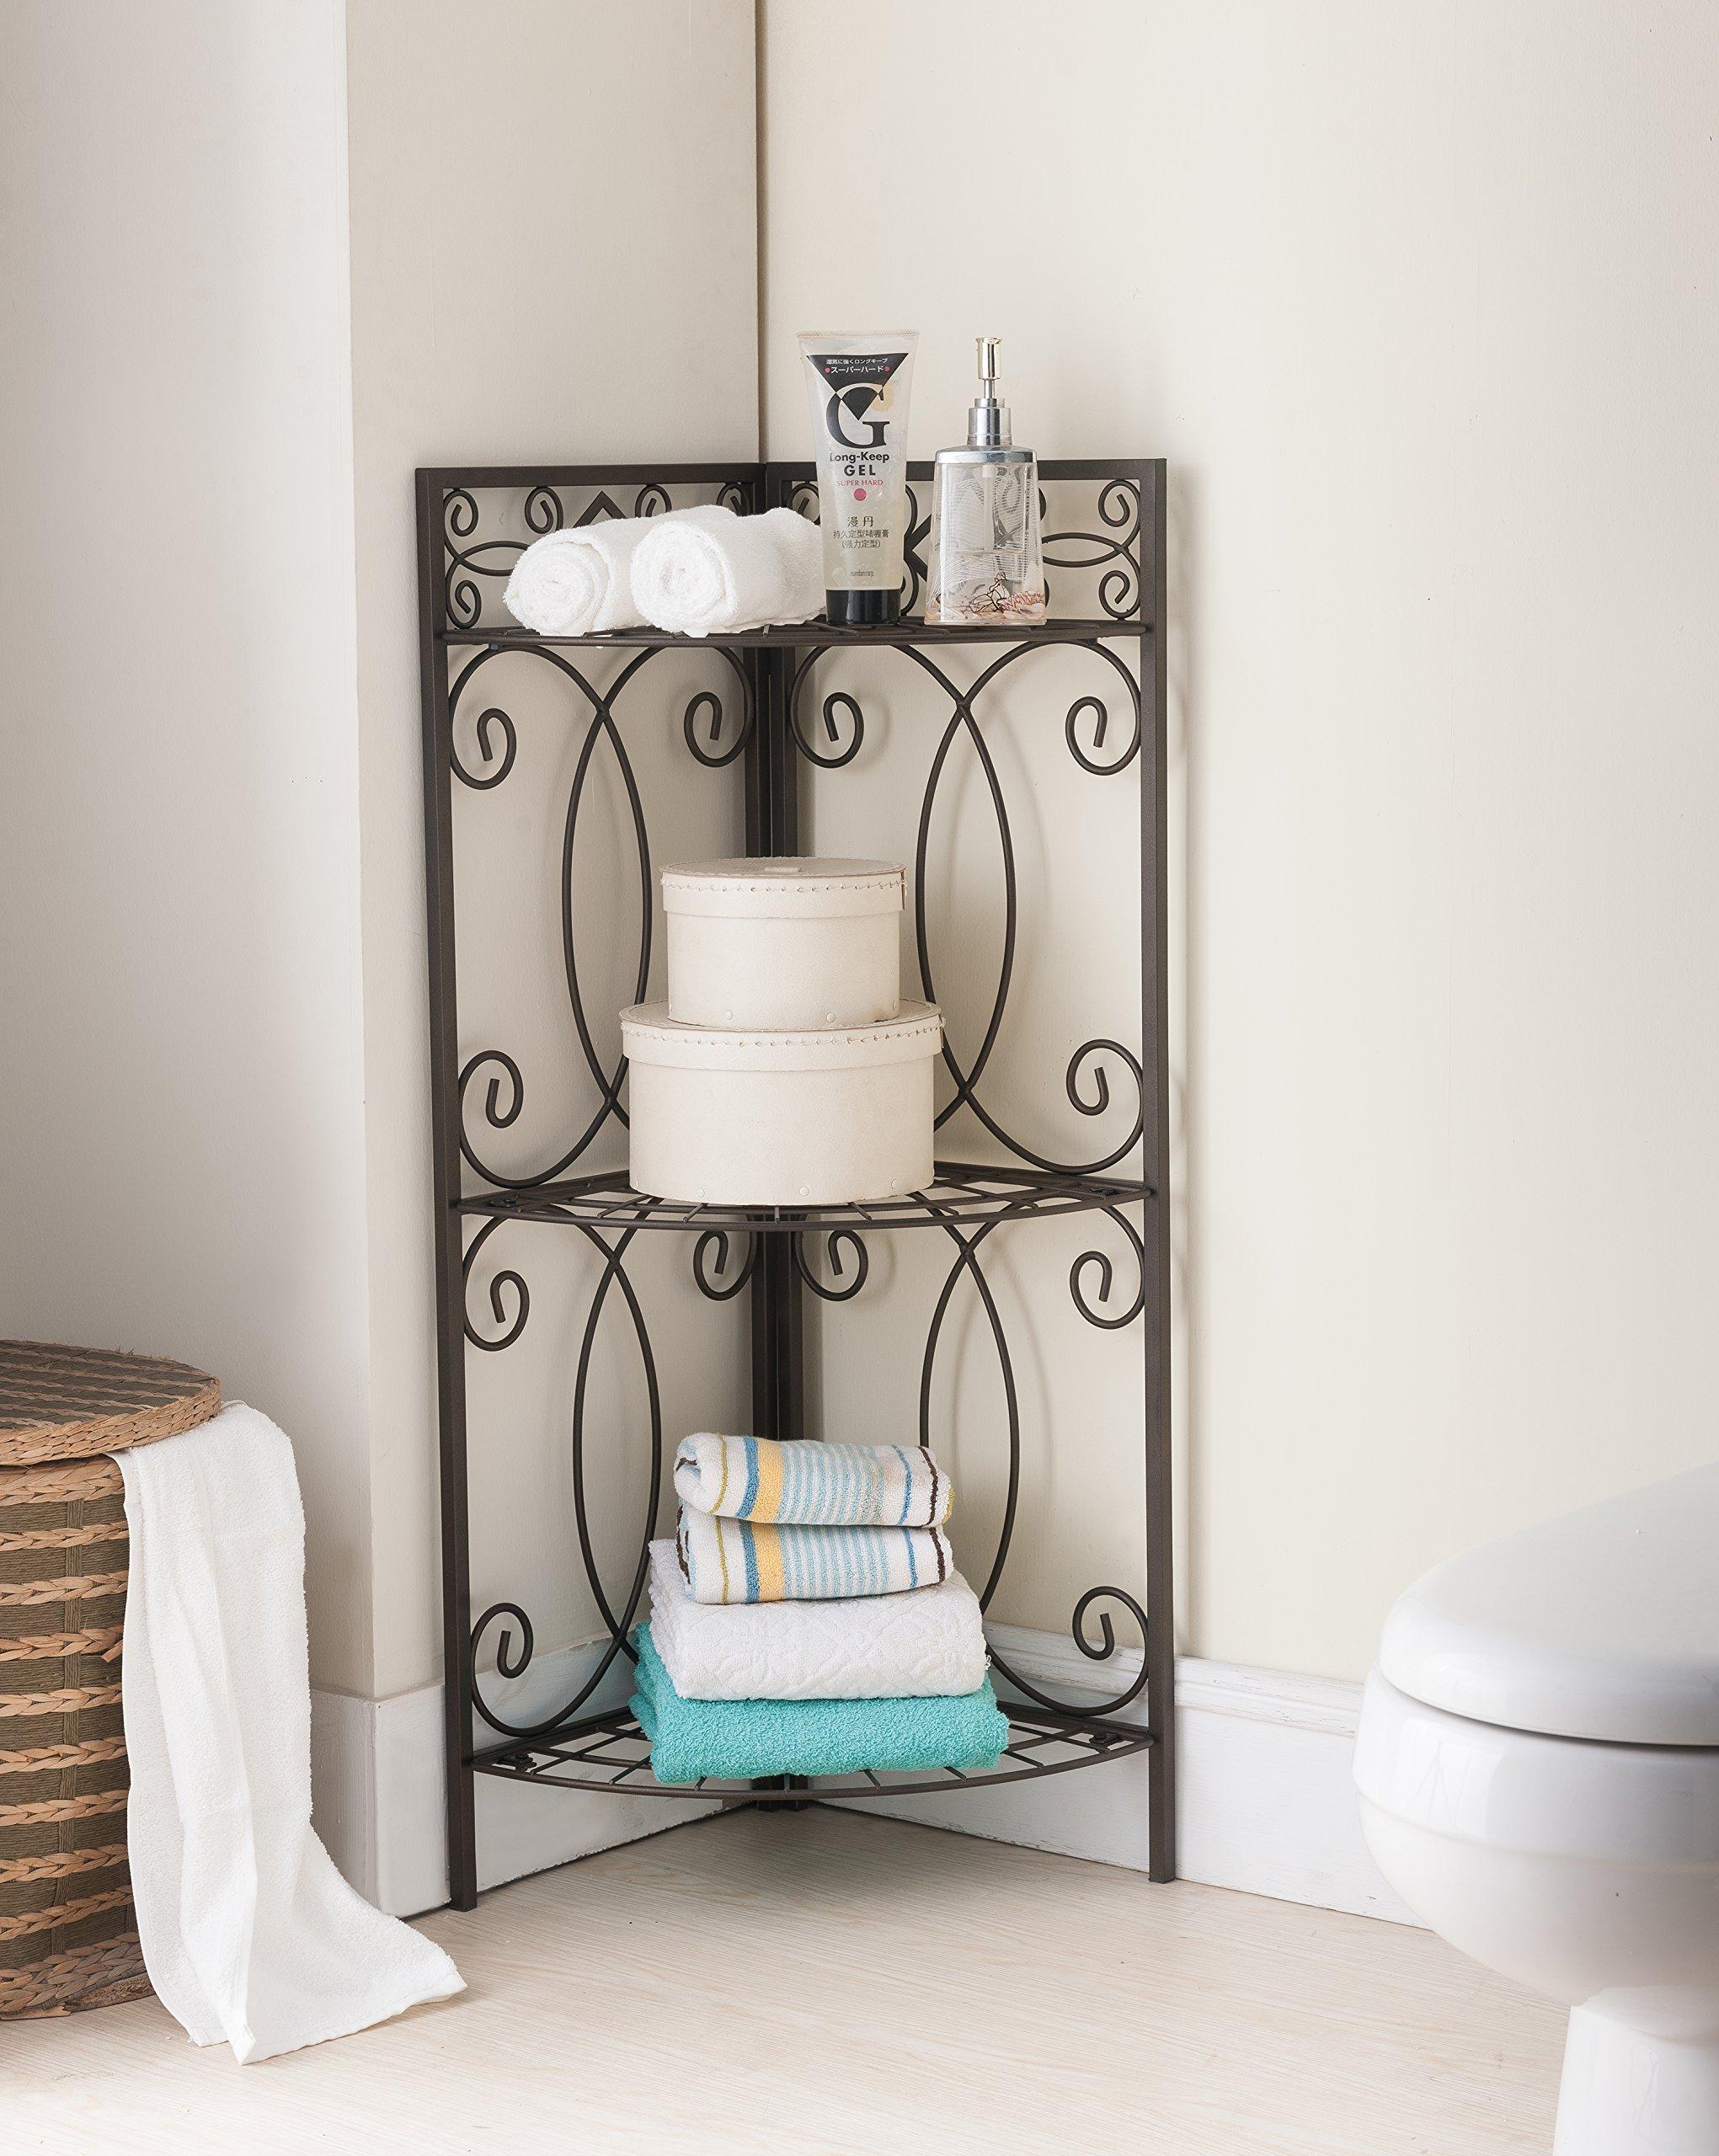 Kings Brand Furniture Metal 3 Tier Shelf Free Standing Corner Bathroom Towel Rack Organizer Stand, Pewter